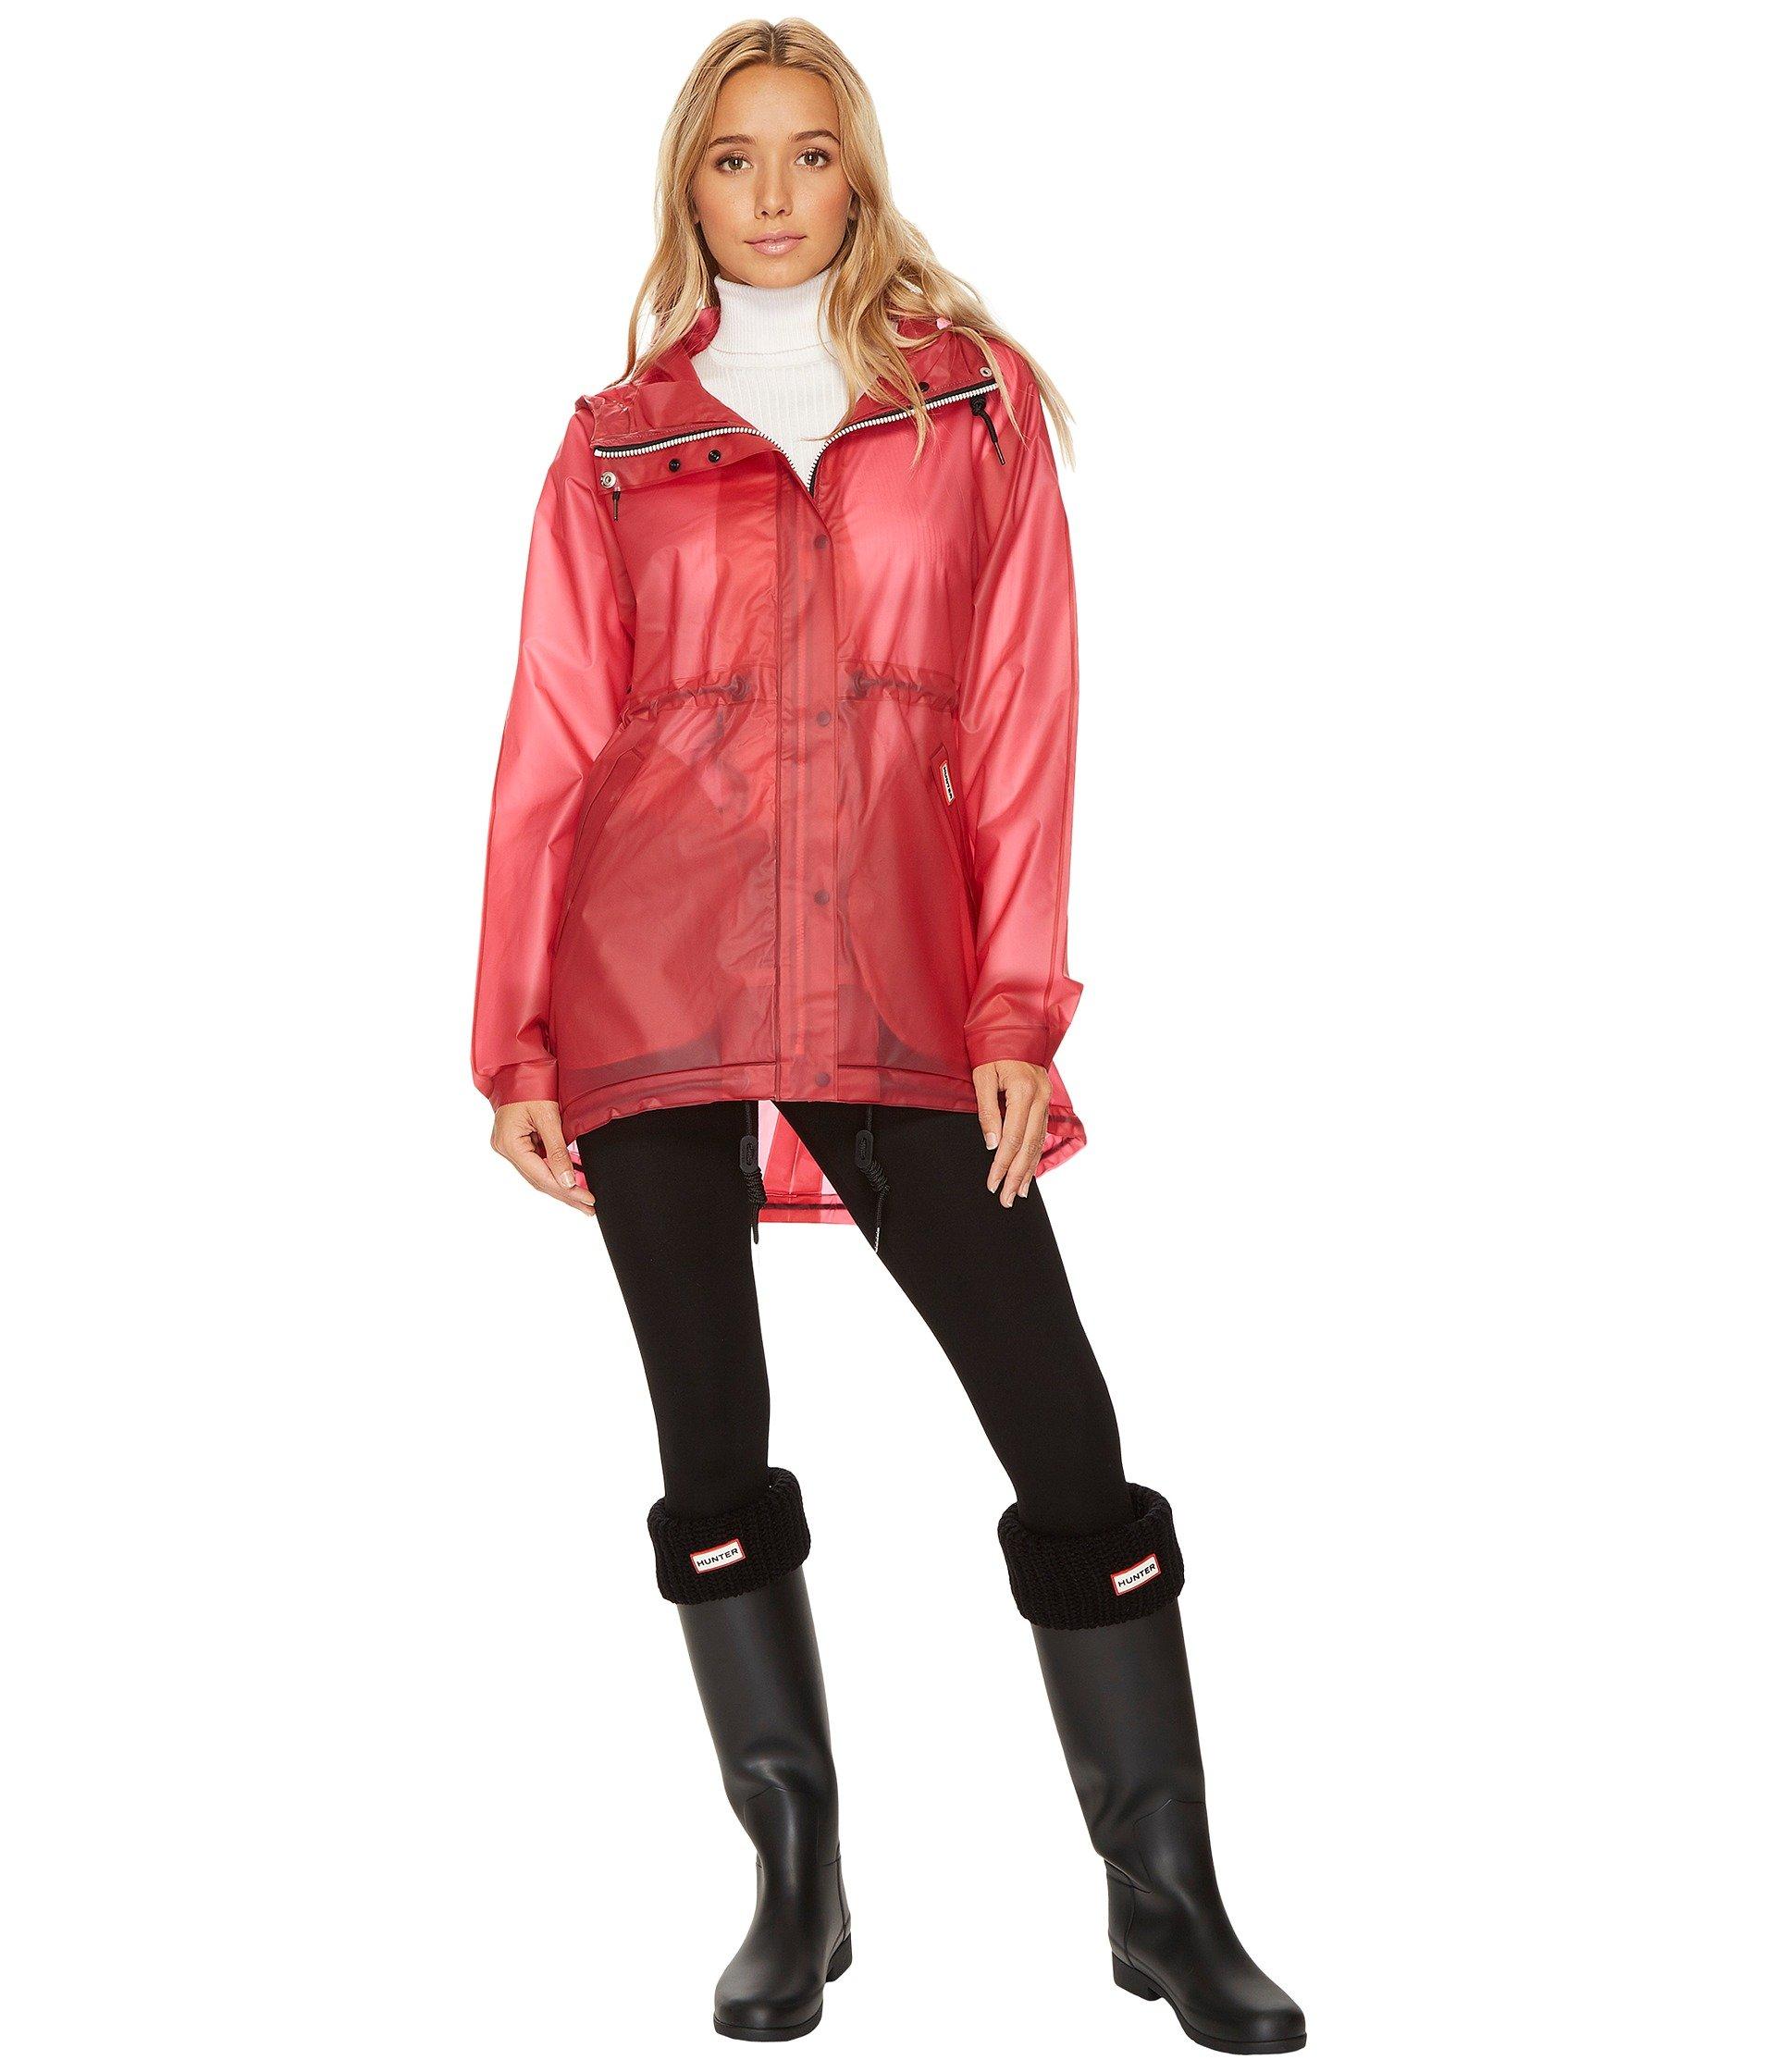 Girls Rain Jackets